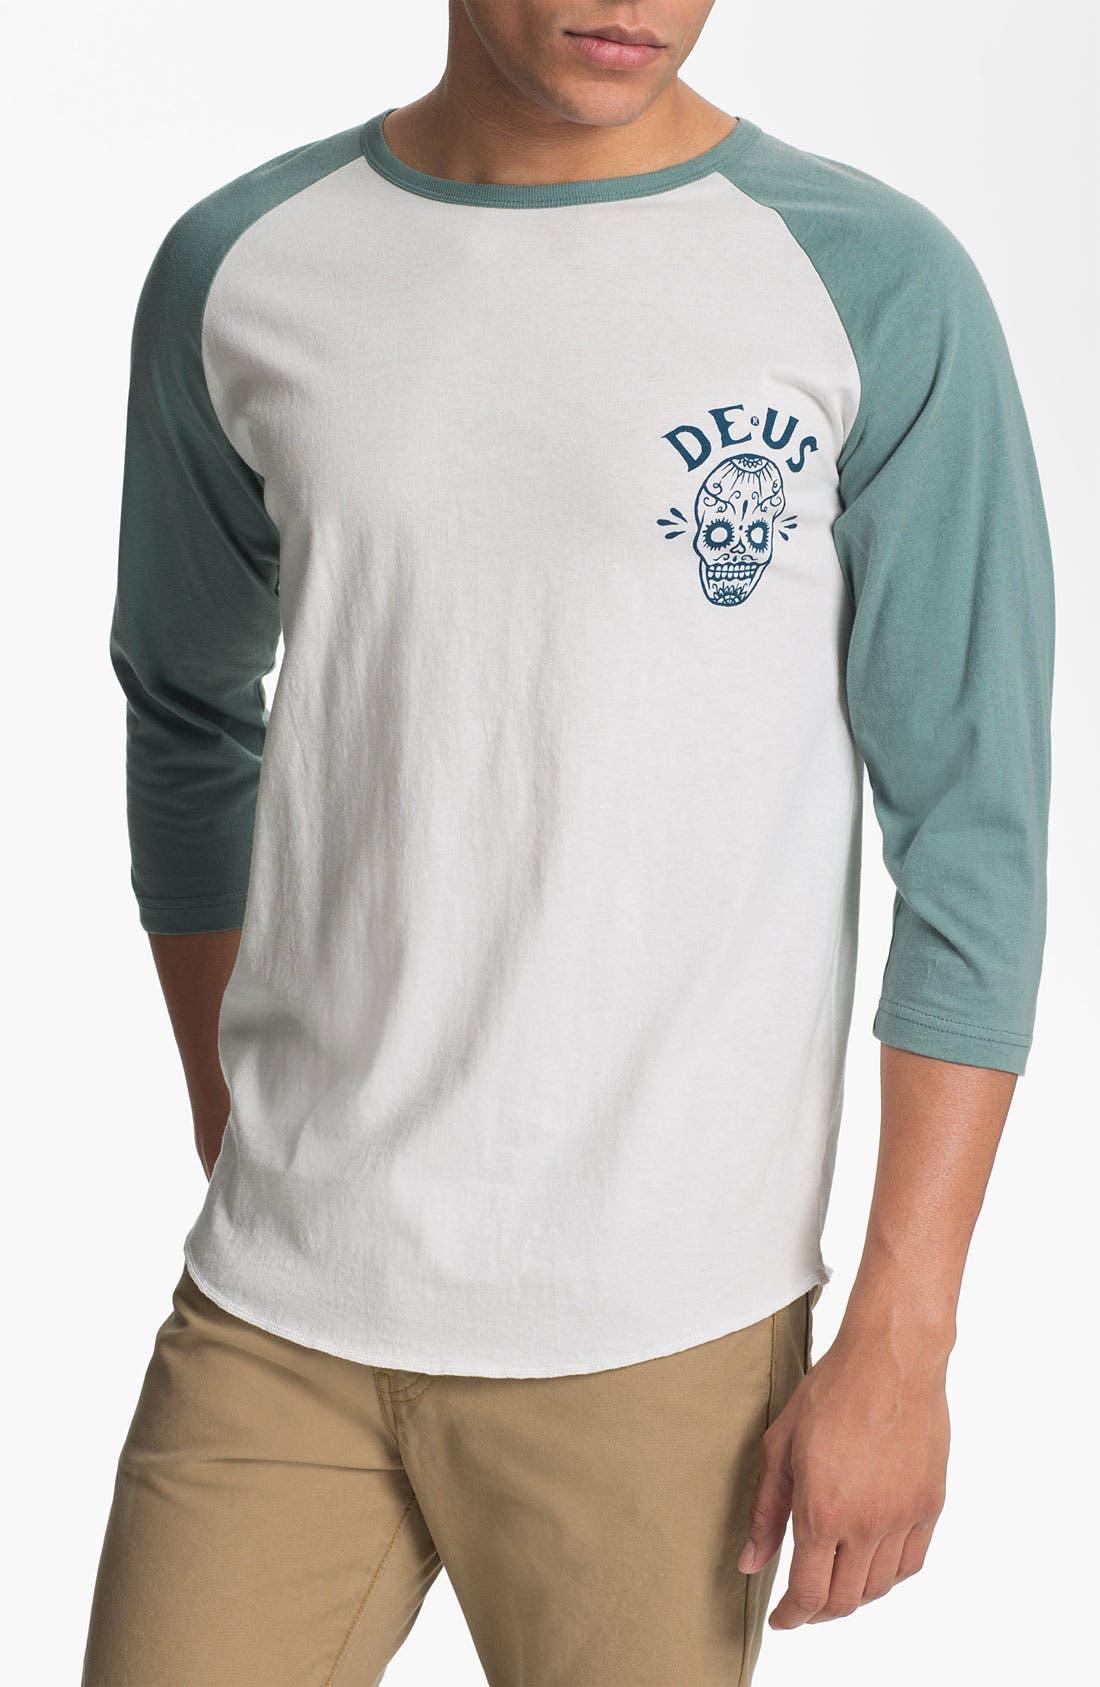 Main Image - Deus Ex Machina 'Deus of the Dead' Graphic Baseball T-Shirt